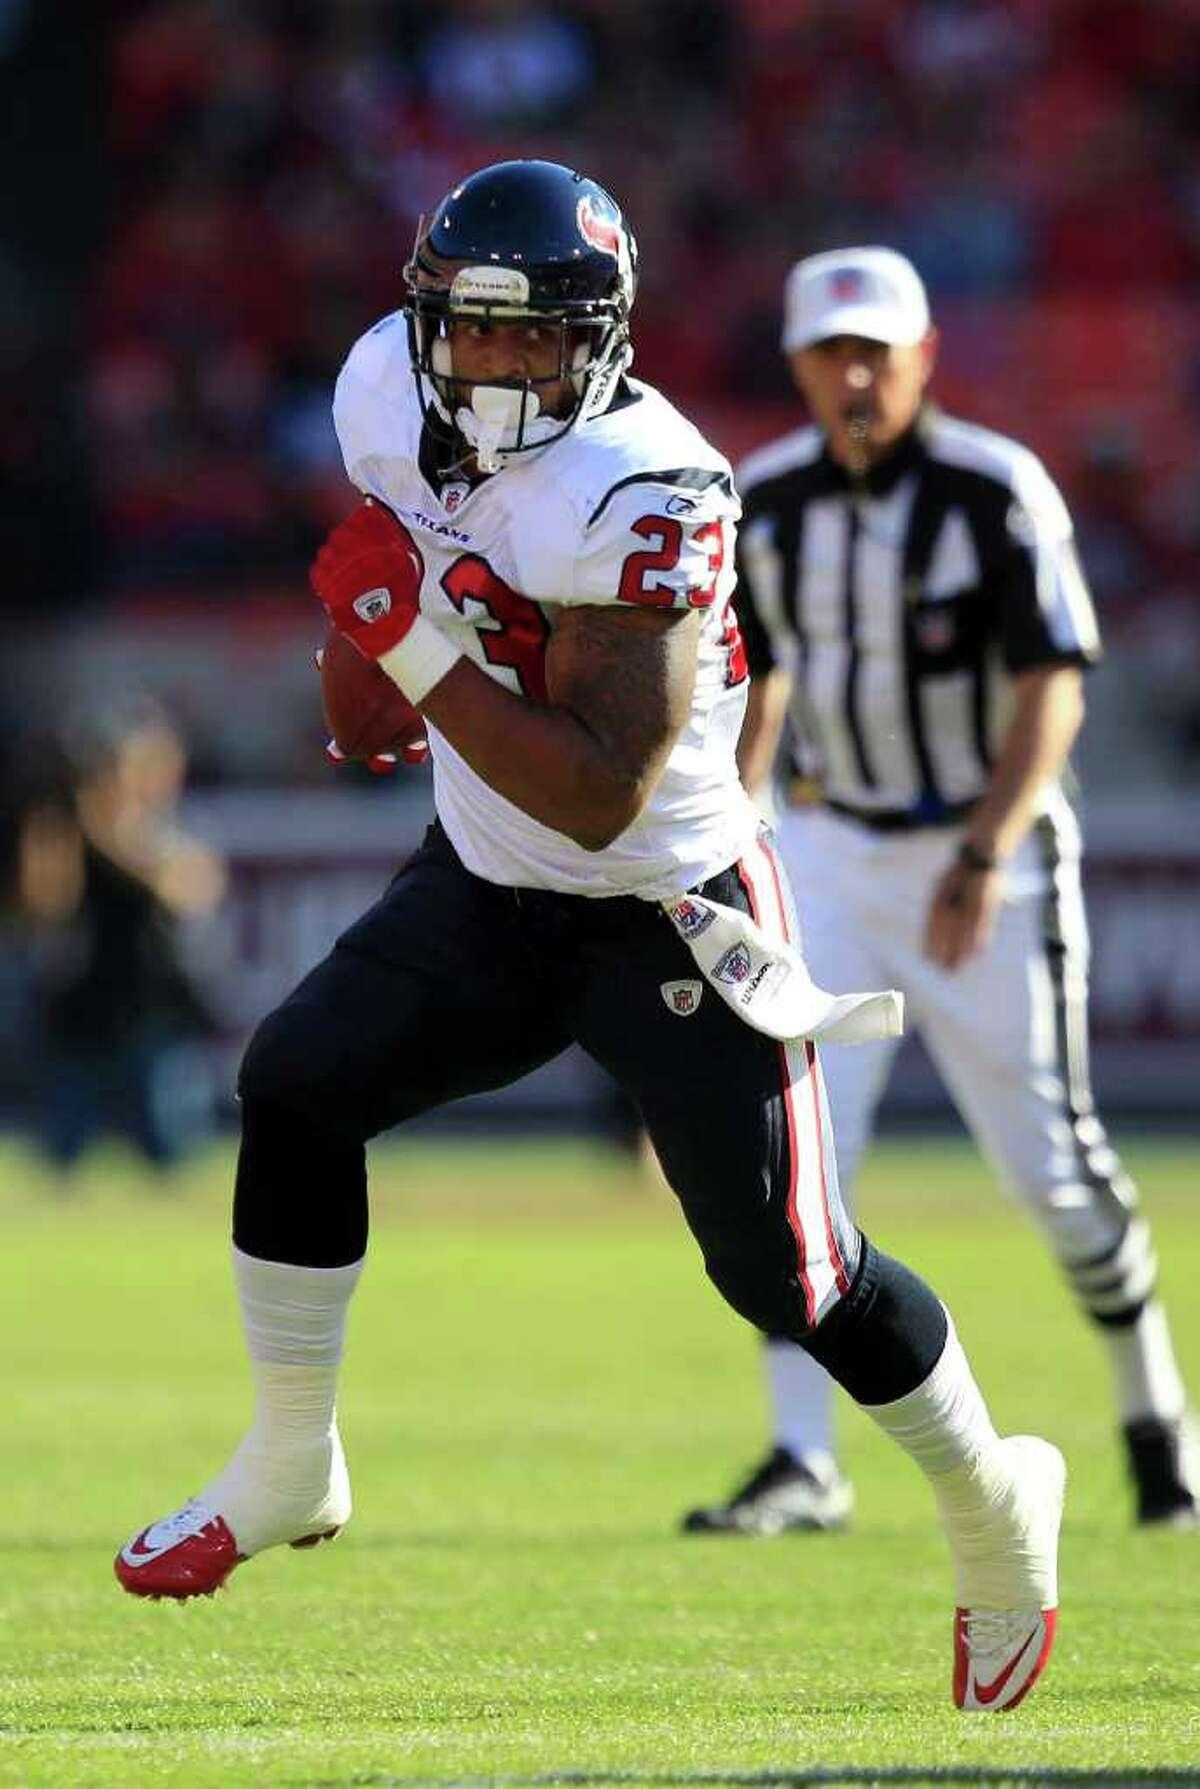 Texans running back Arian Foster runs against the 49ers.